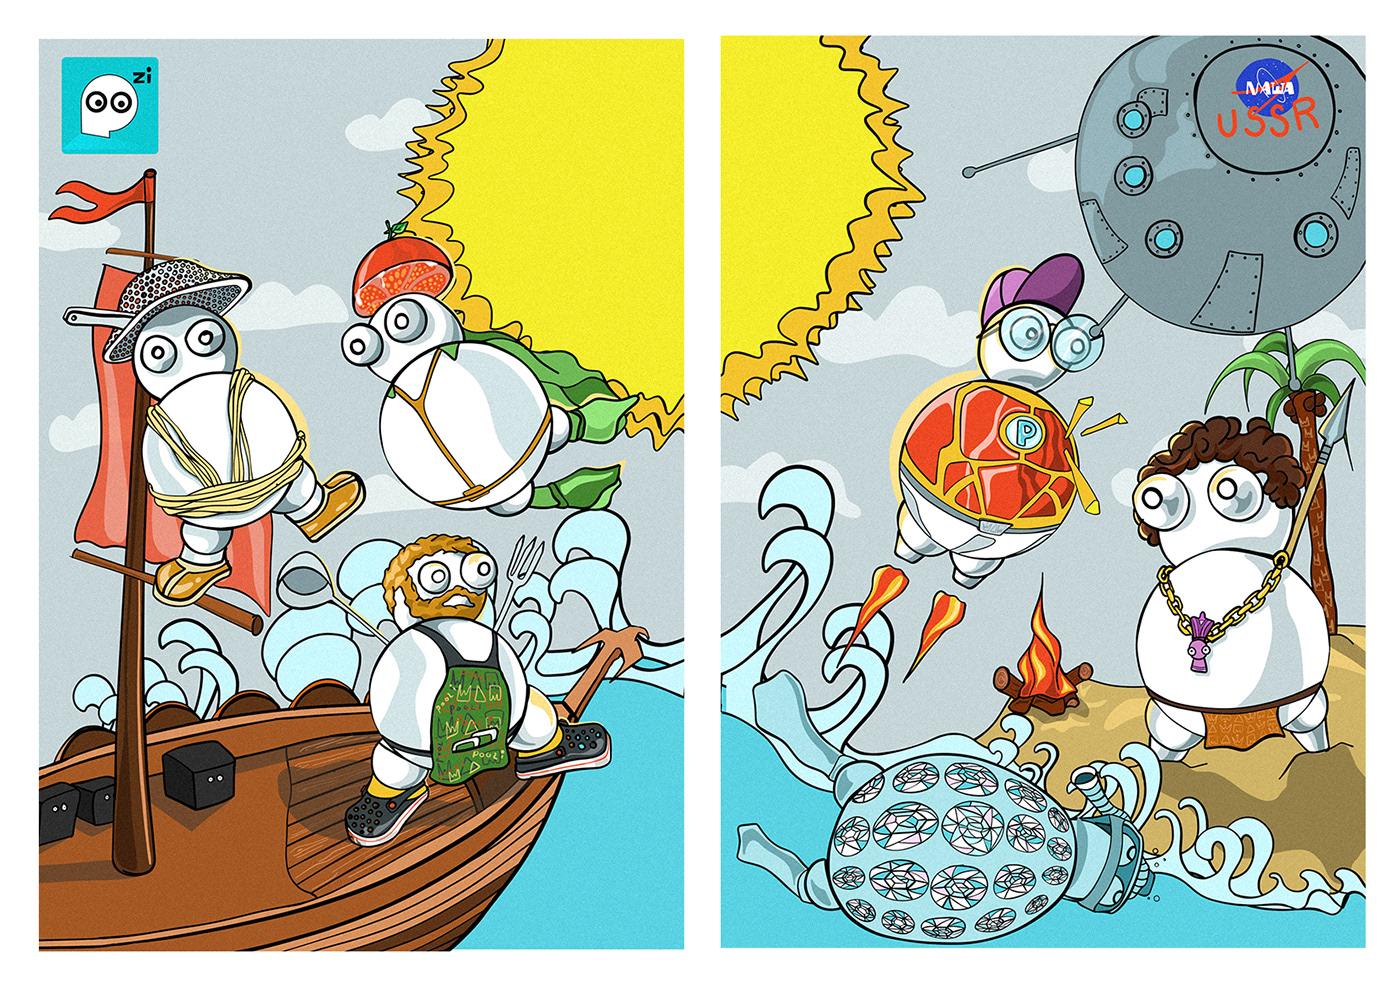 animation  bubbles Poozi woodigram beach cartoon satellite sea ship Sun